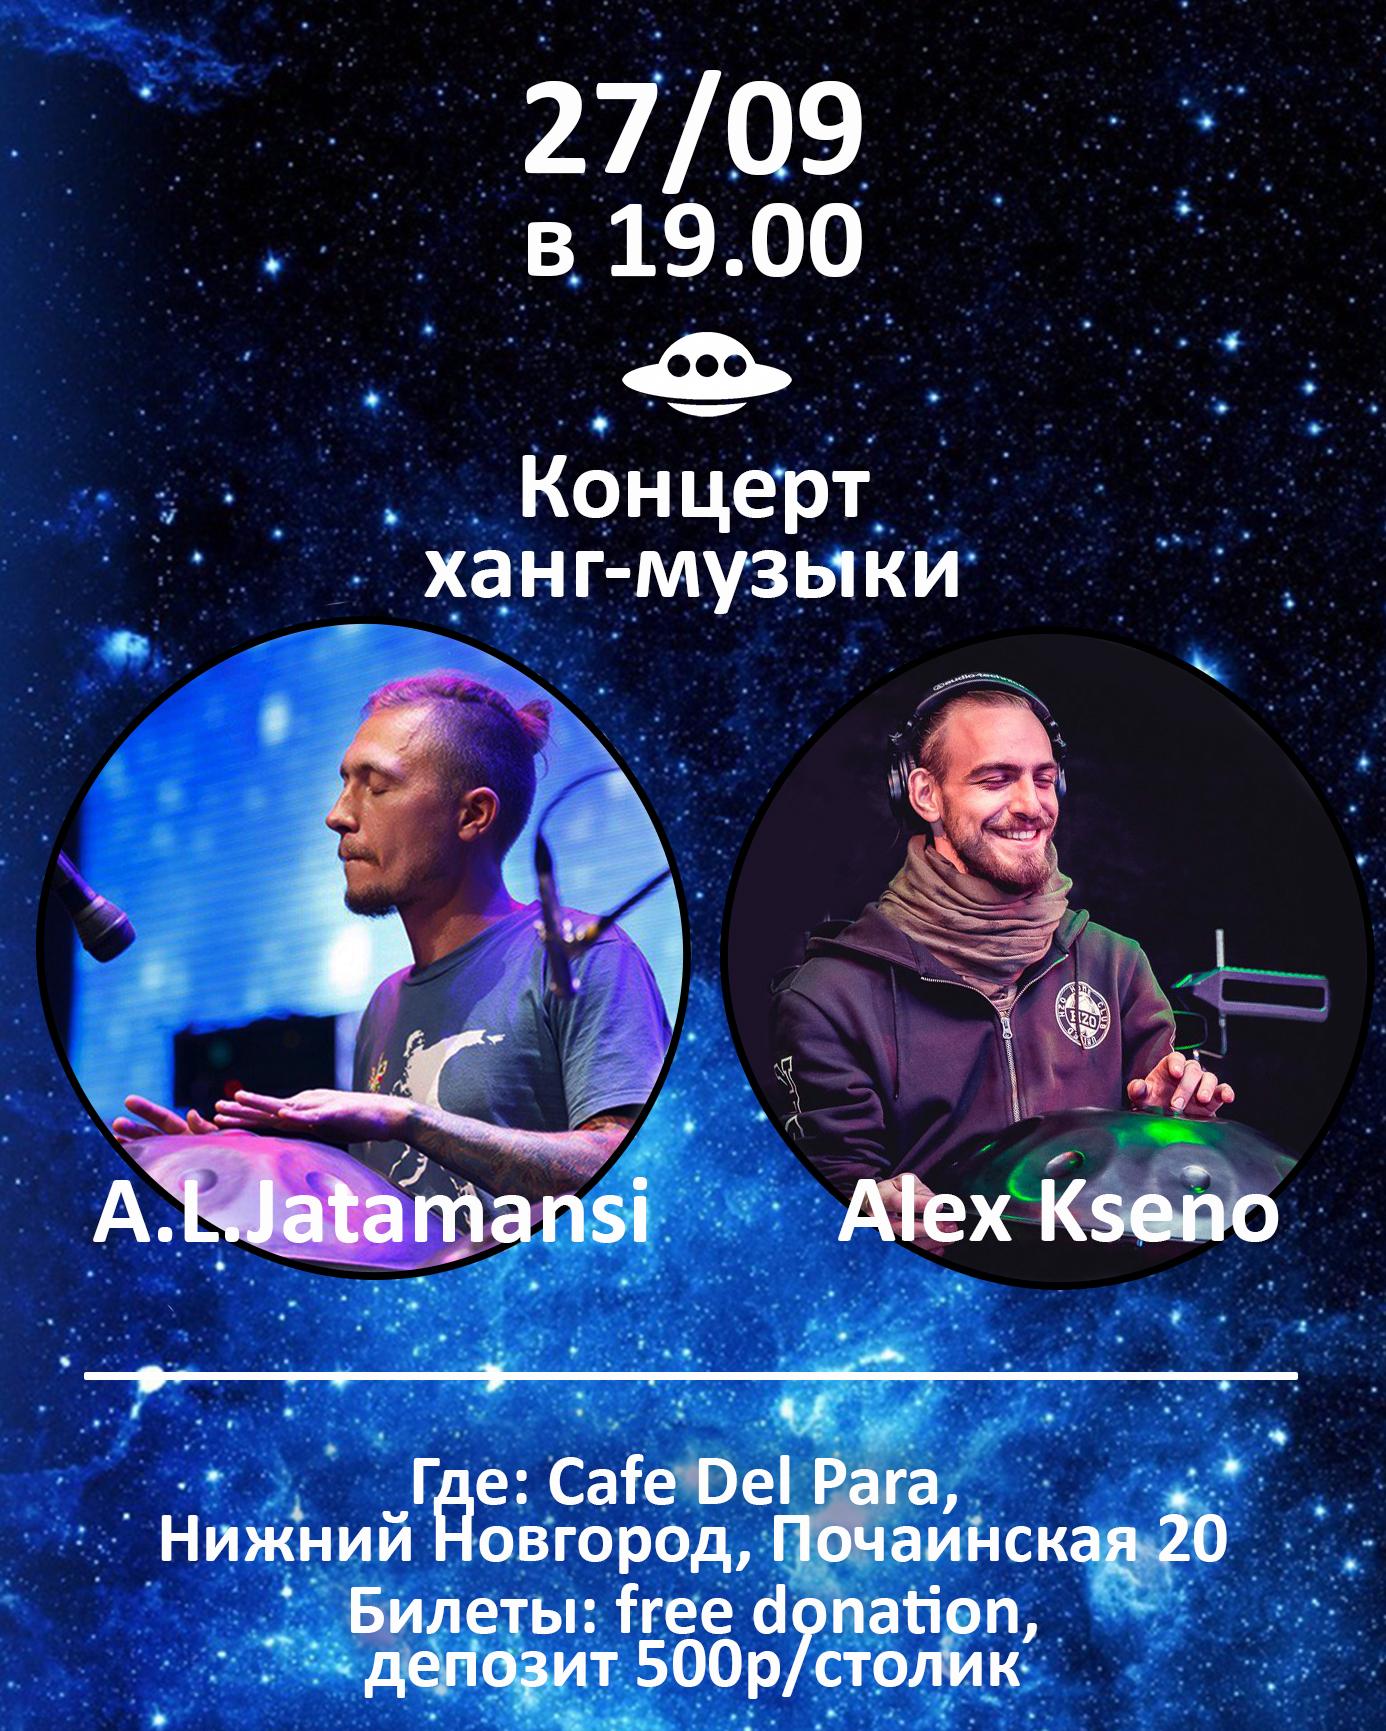 КОНЦЕРТ: ALEX KSENO & JATAMANSI | ХАНГИ